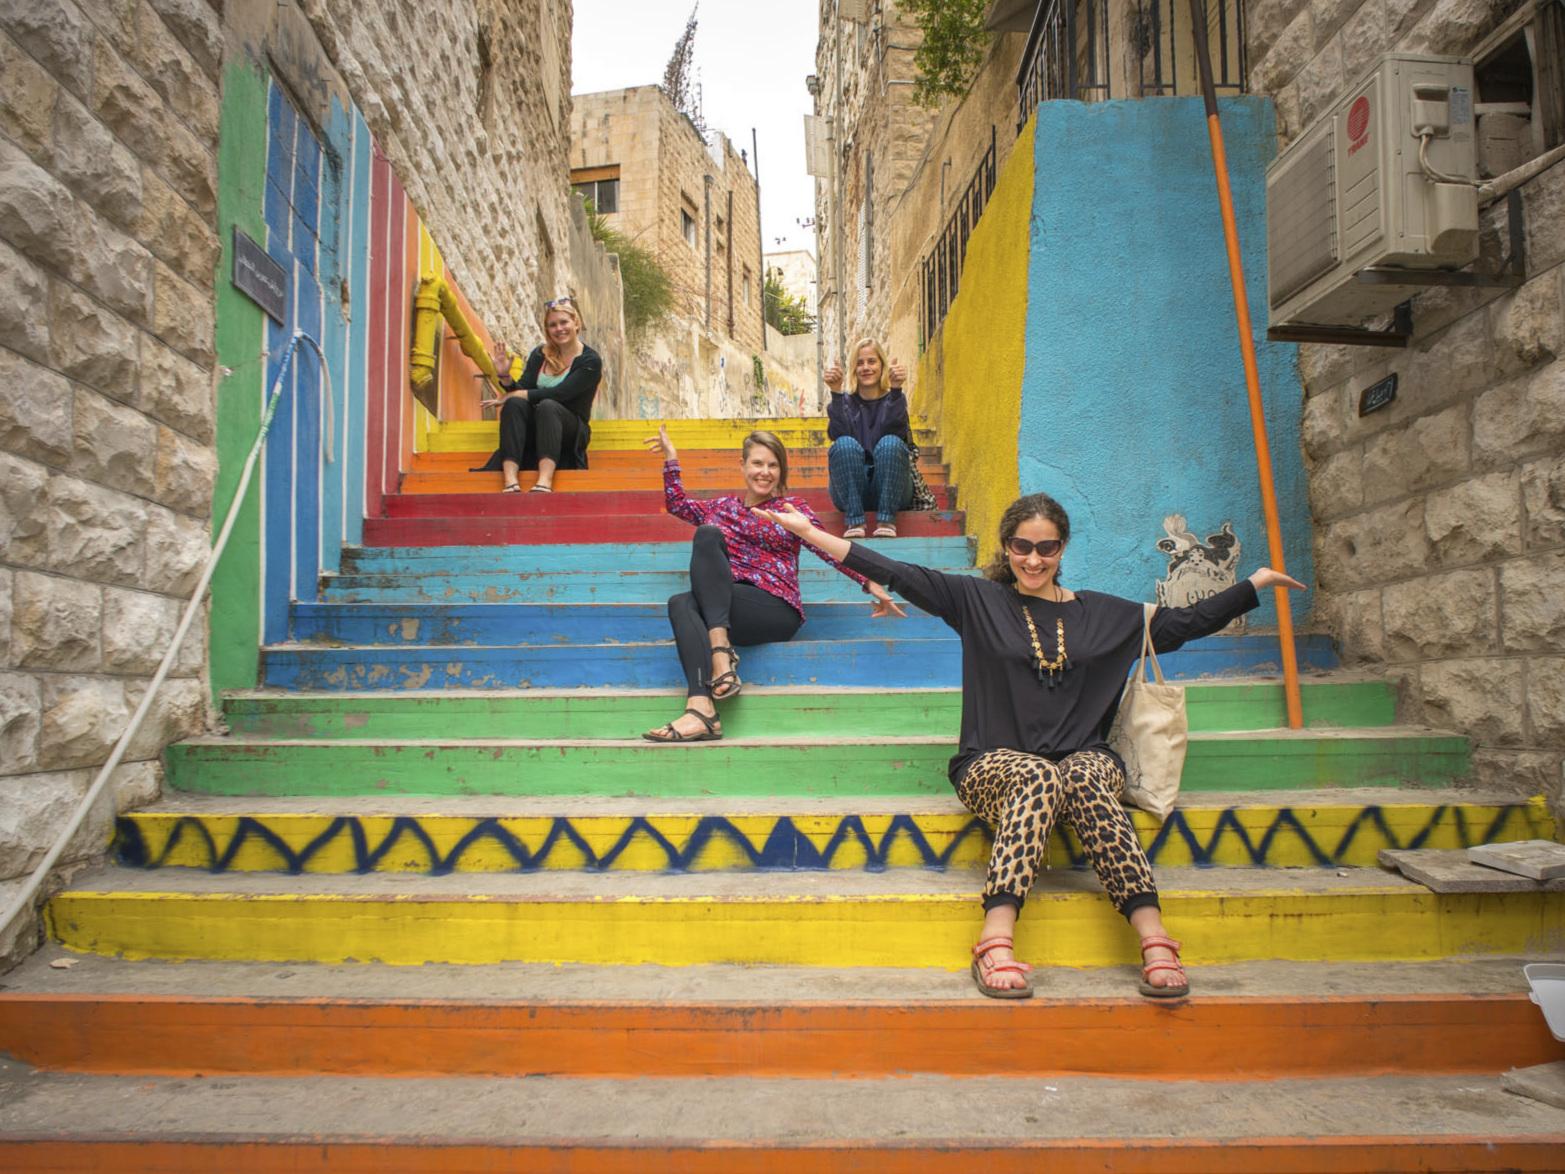 Women can feel safe exploring Jordan alone